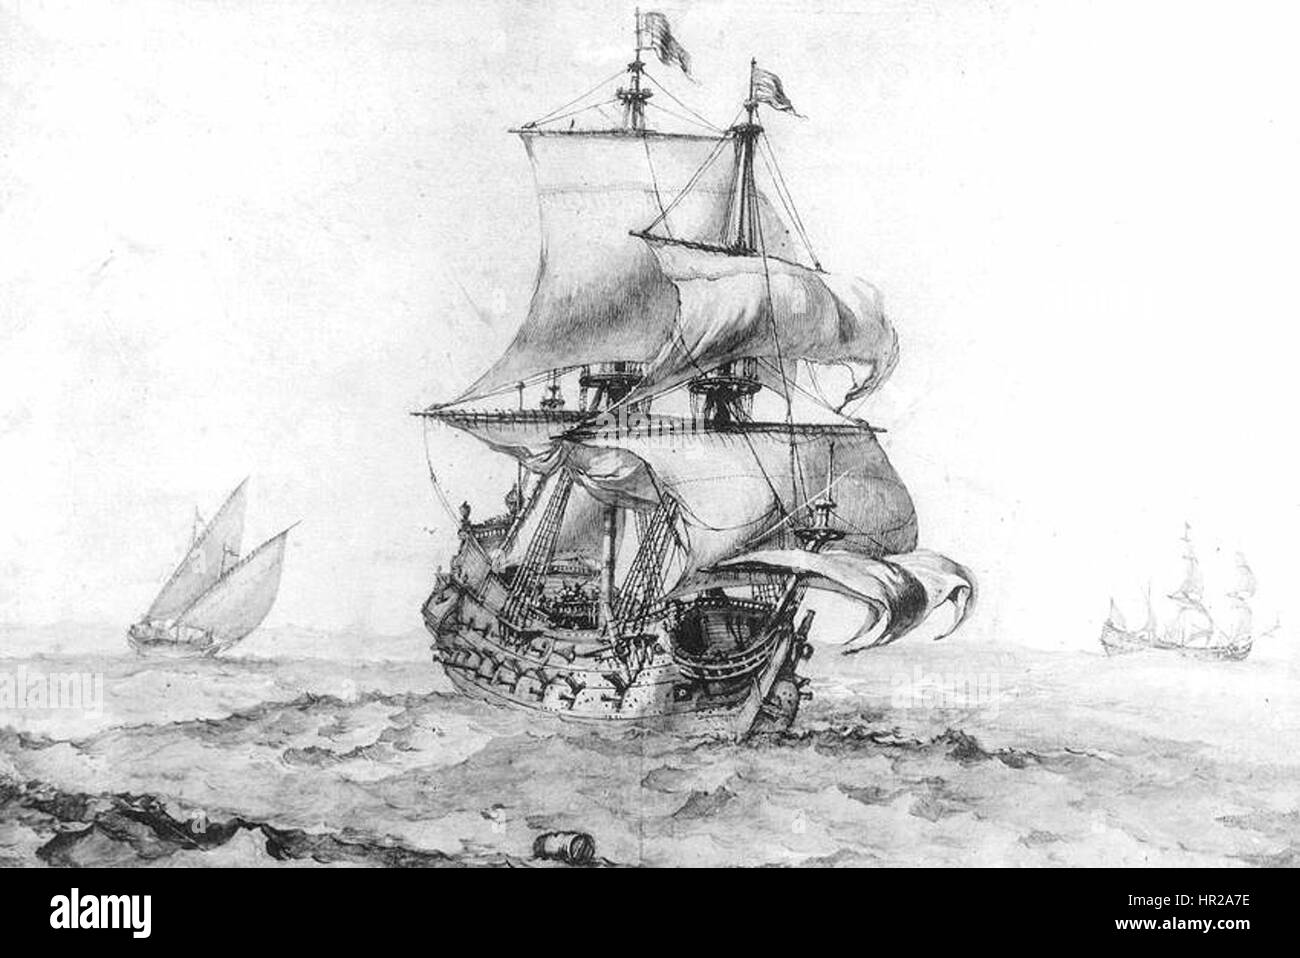 Pierre Puget - Great Vessel of War - WGA18476 - Stock Image